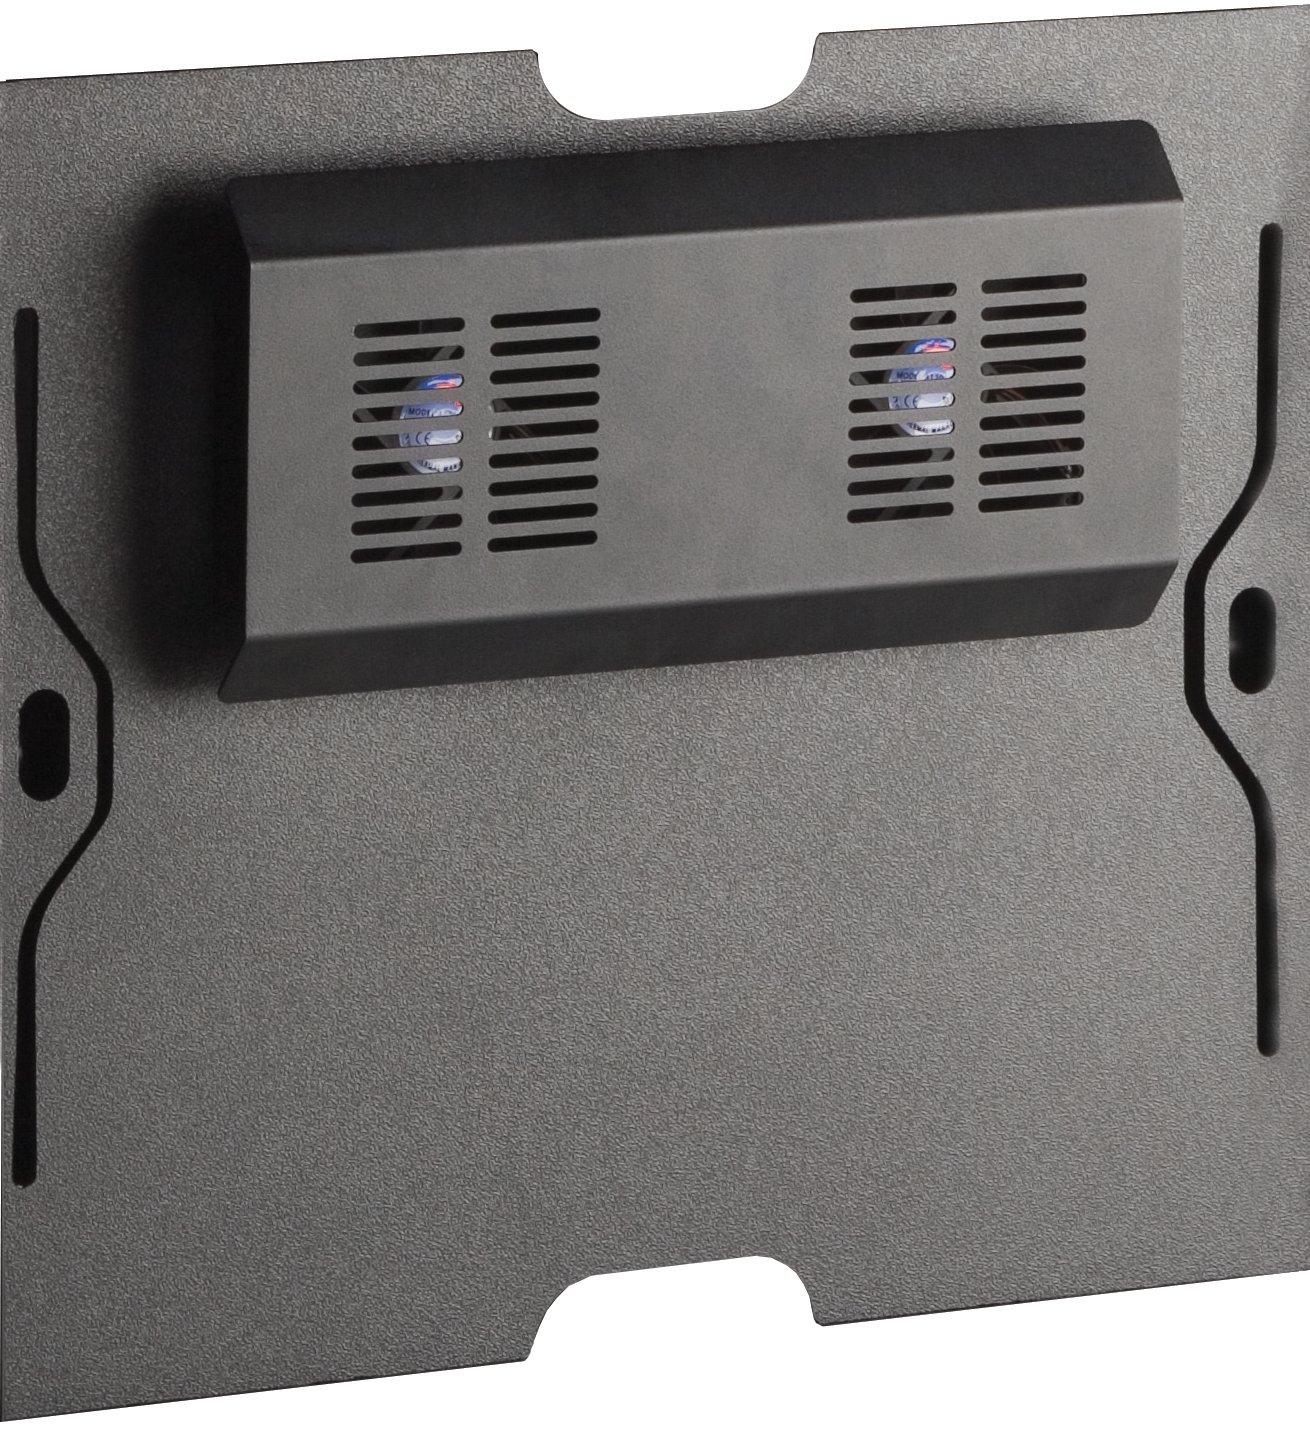 Salamander Chameleon Active Cooling Rear Panel for 20-Inch-Tall Cabinets by Salamander Designs (Image #1)